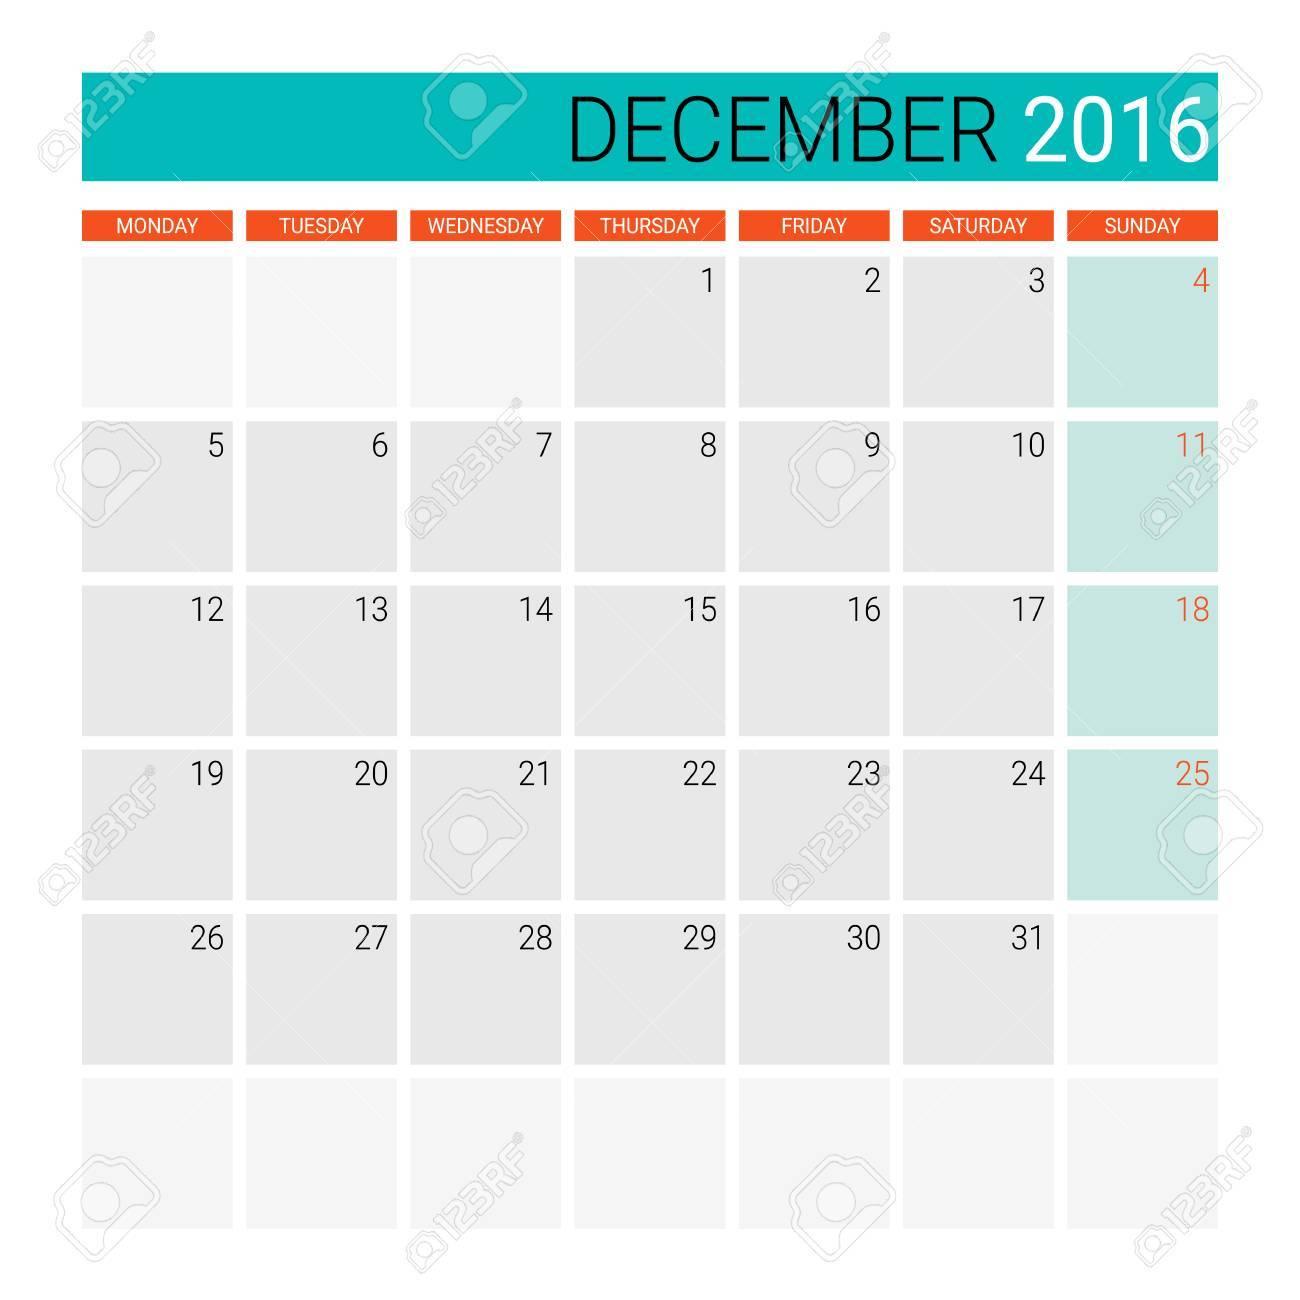 December 2016 Calendar Or Desk Planner Royalty Free Cliparts